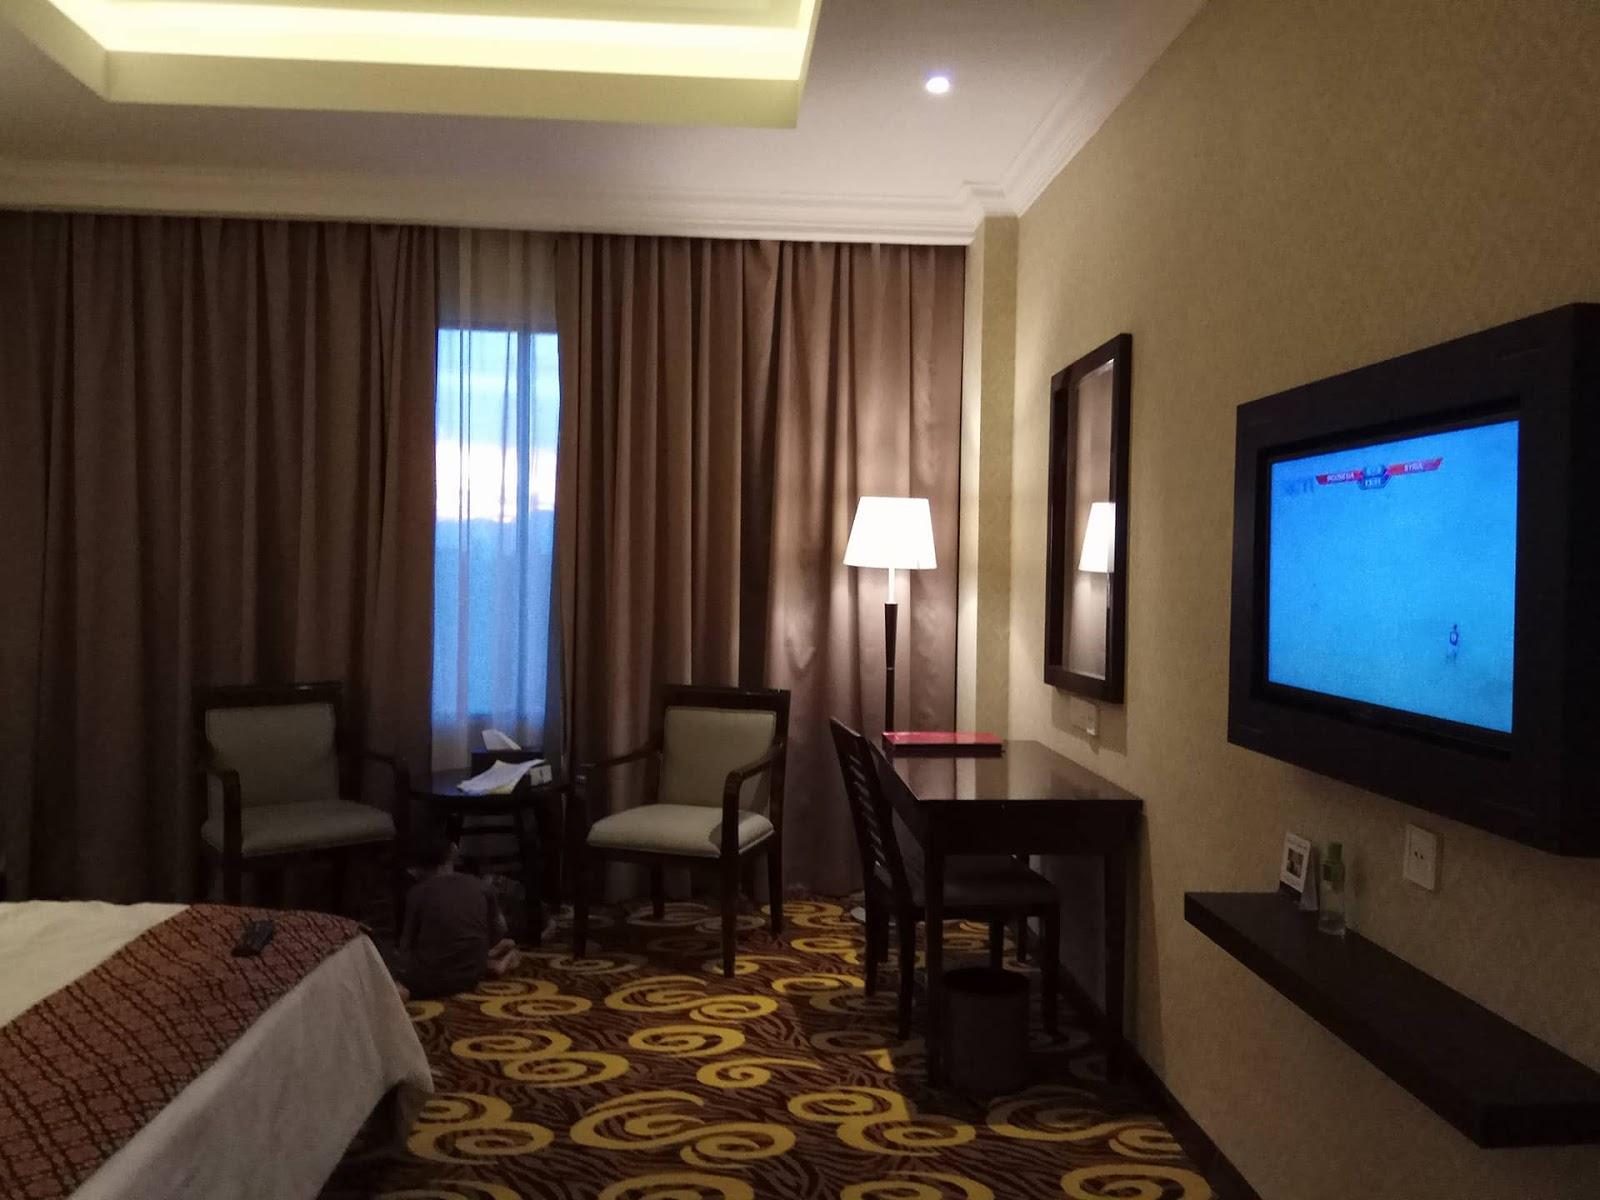 Www Khairiah Com Nginap Di Hotel Hermes Palace Banda Aceh Bersama Anak Anak